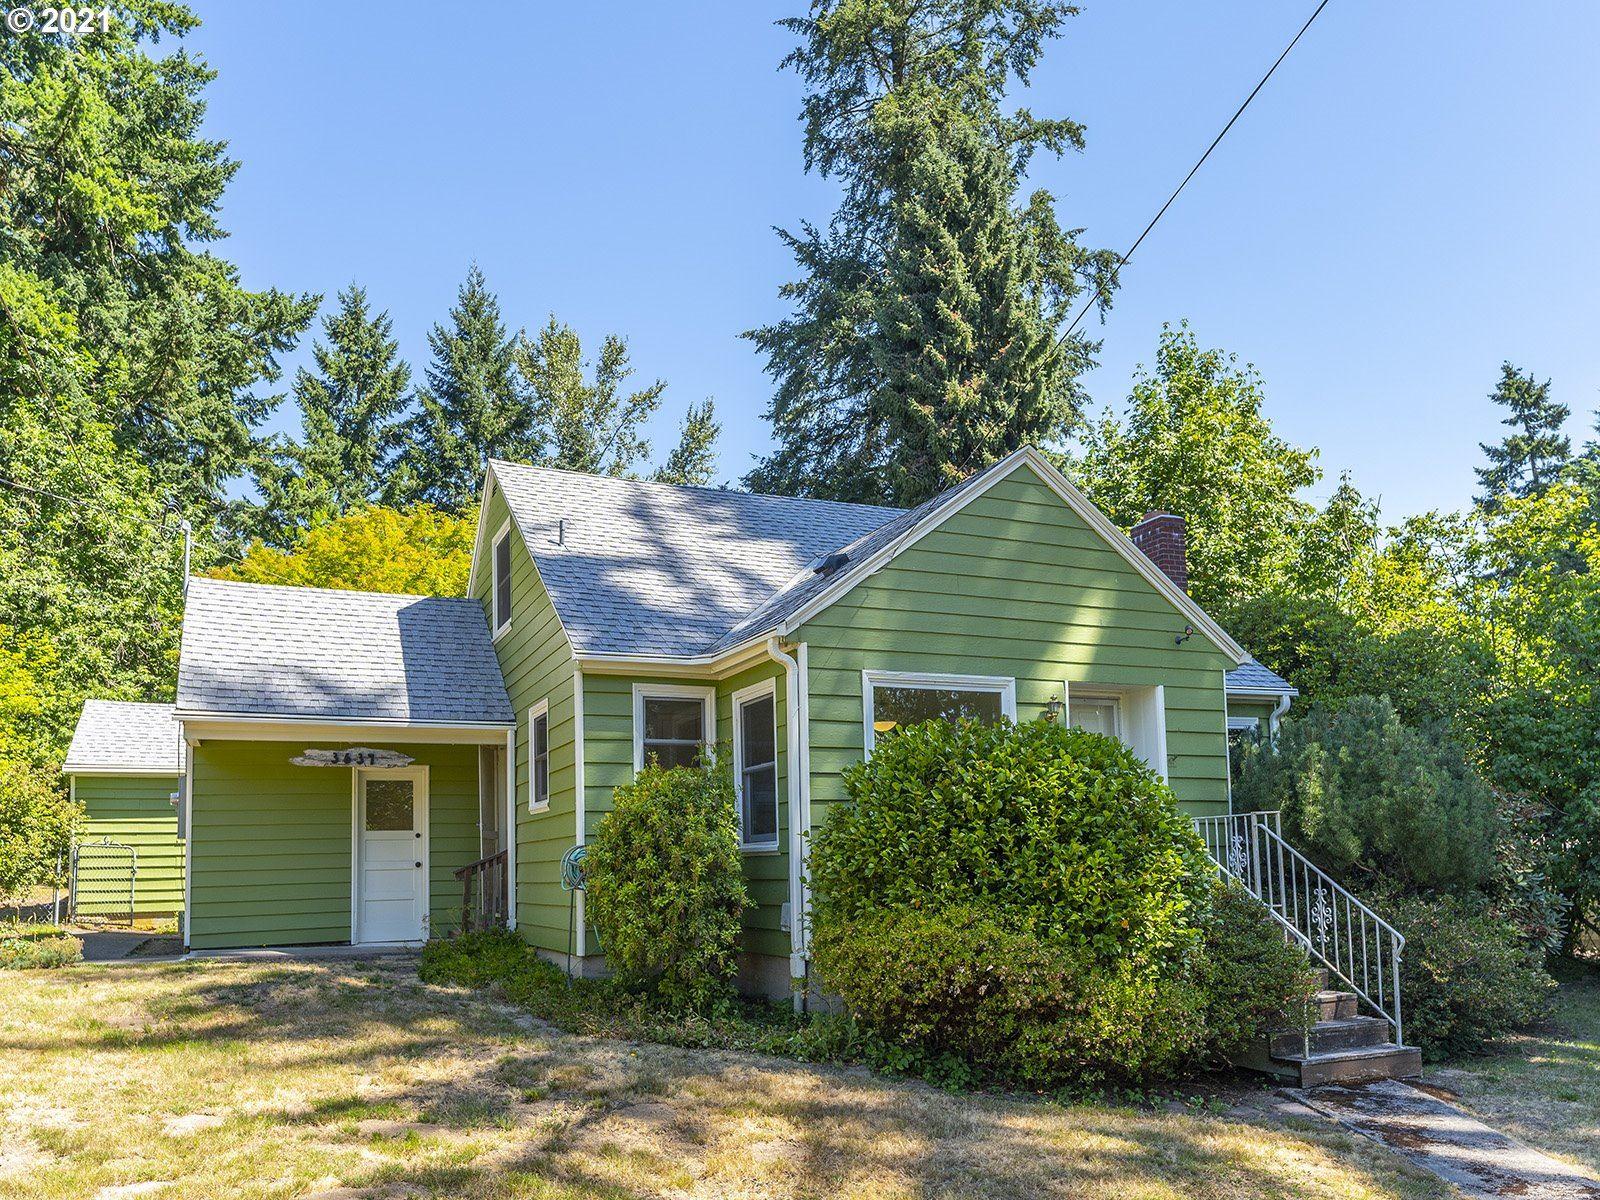 3637 SW COMUS ST, Portland, OR 97219 - MLS#: 21357708